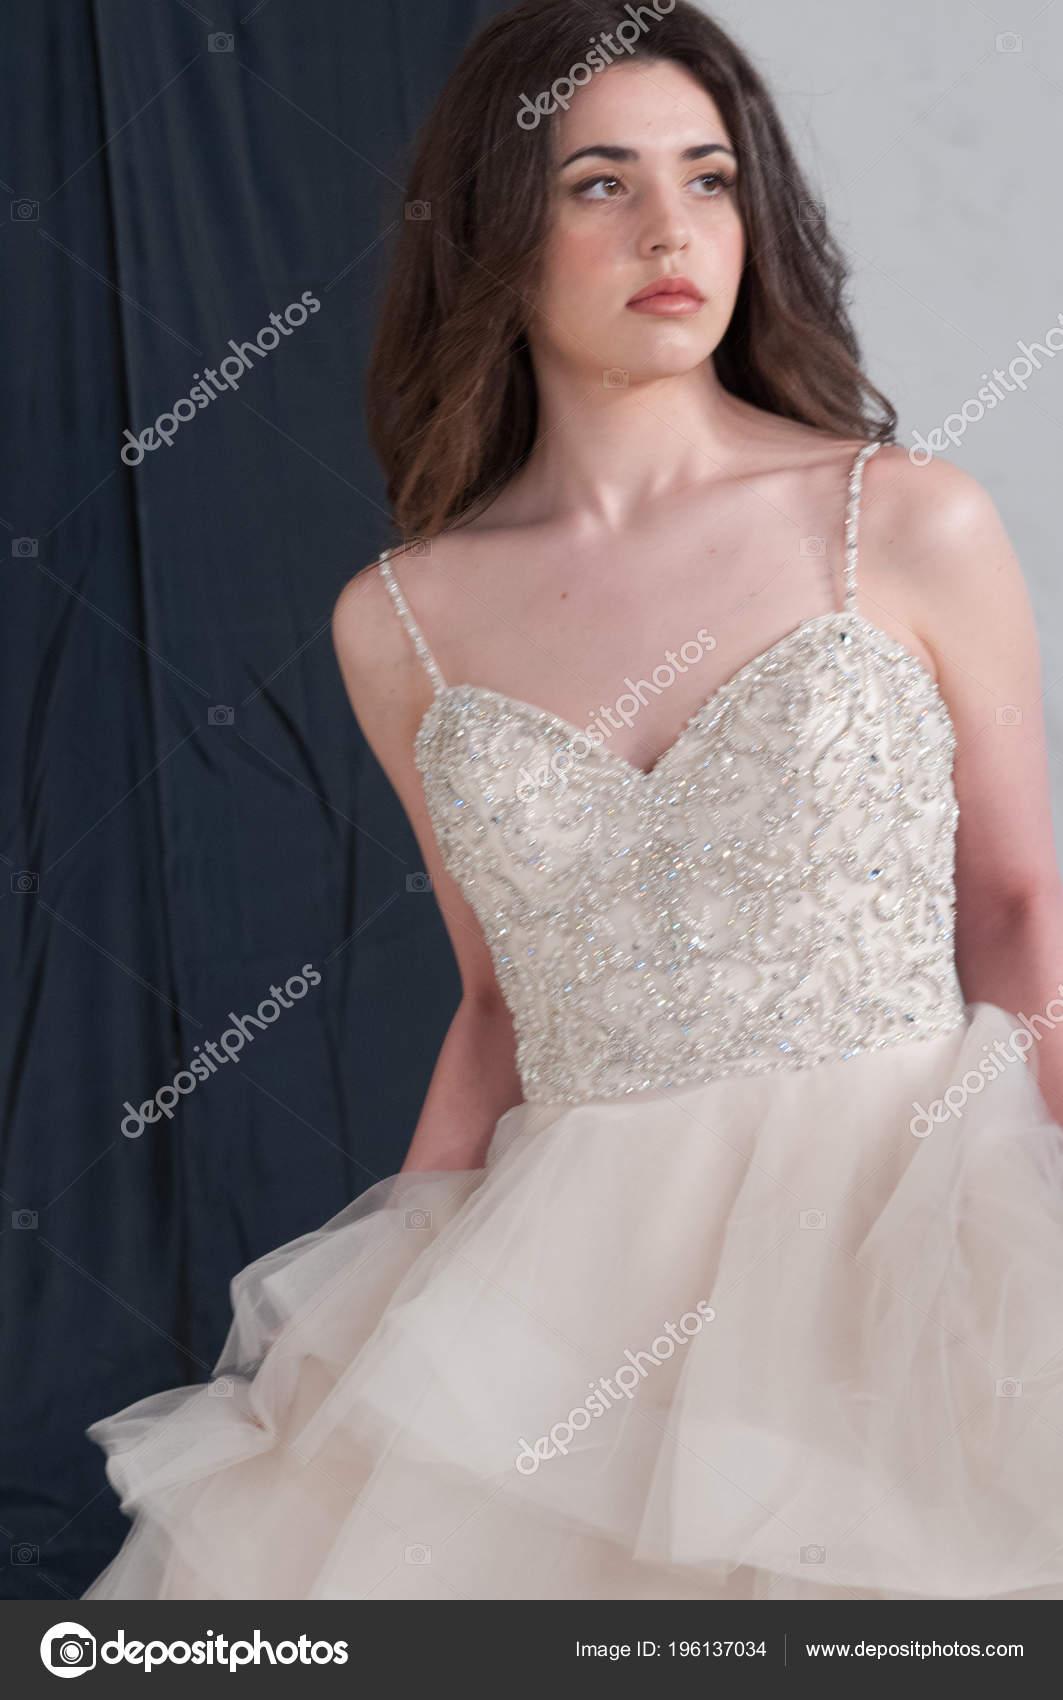 10e93e8079ea Νεαρή νύφη φορώντας γάμο φόρεμα νύφη ιβουάρ Δαντελένιο μπούστο διακοσμημένο  με χάντρες